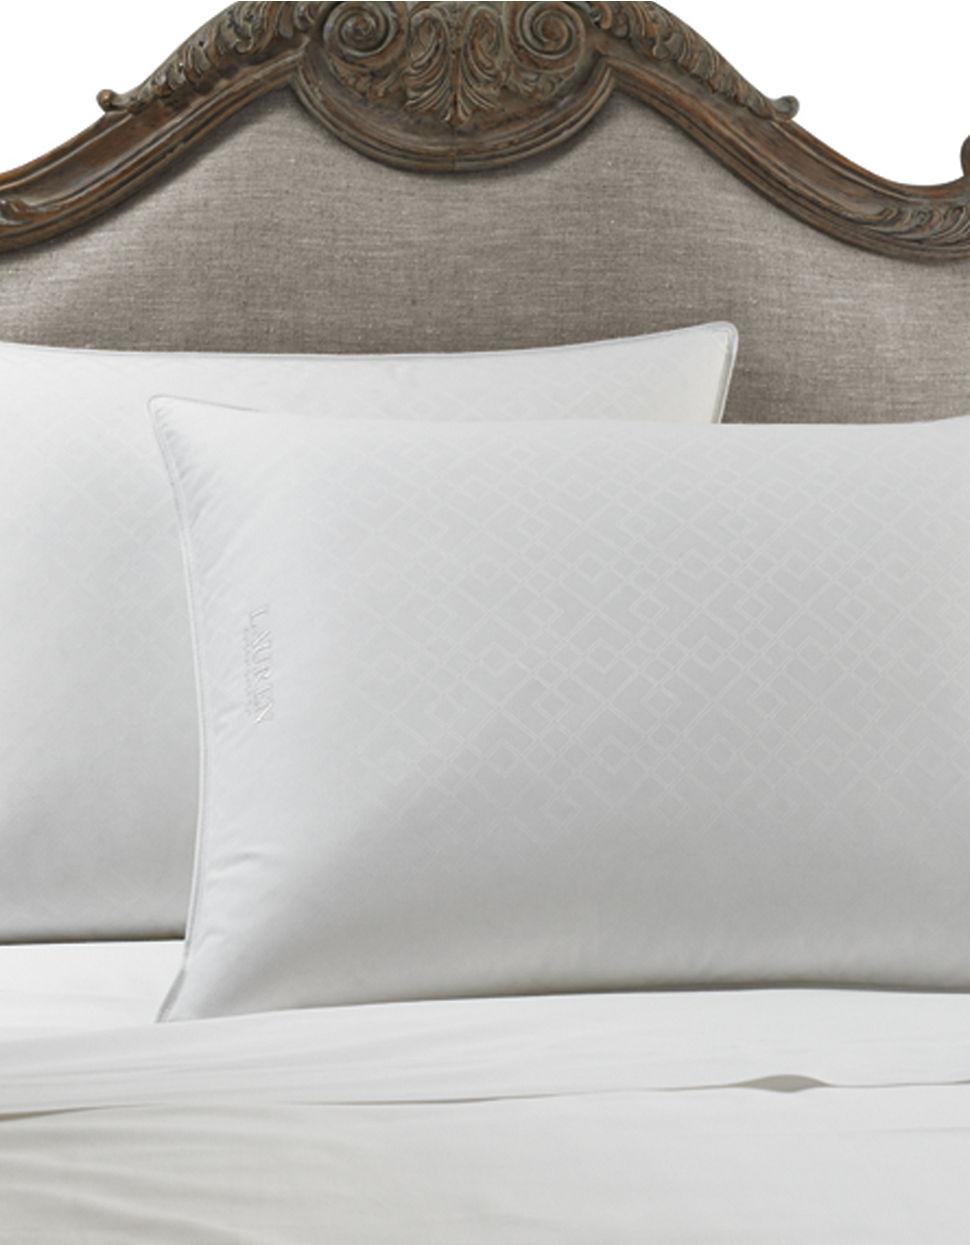 Trellis Silver Comfort Trilogy Pillow